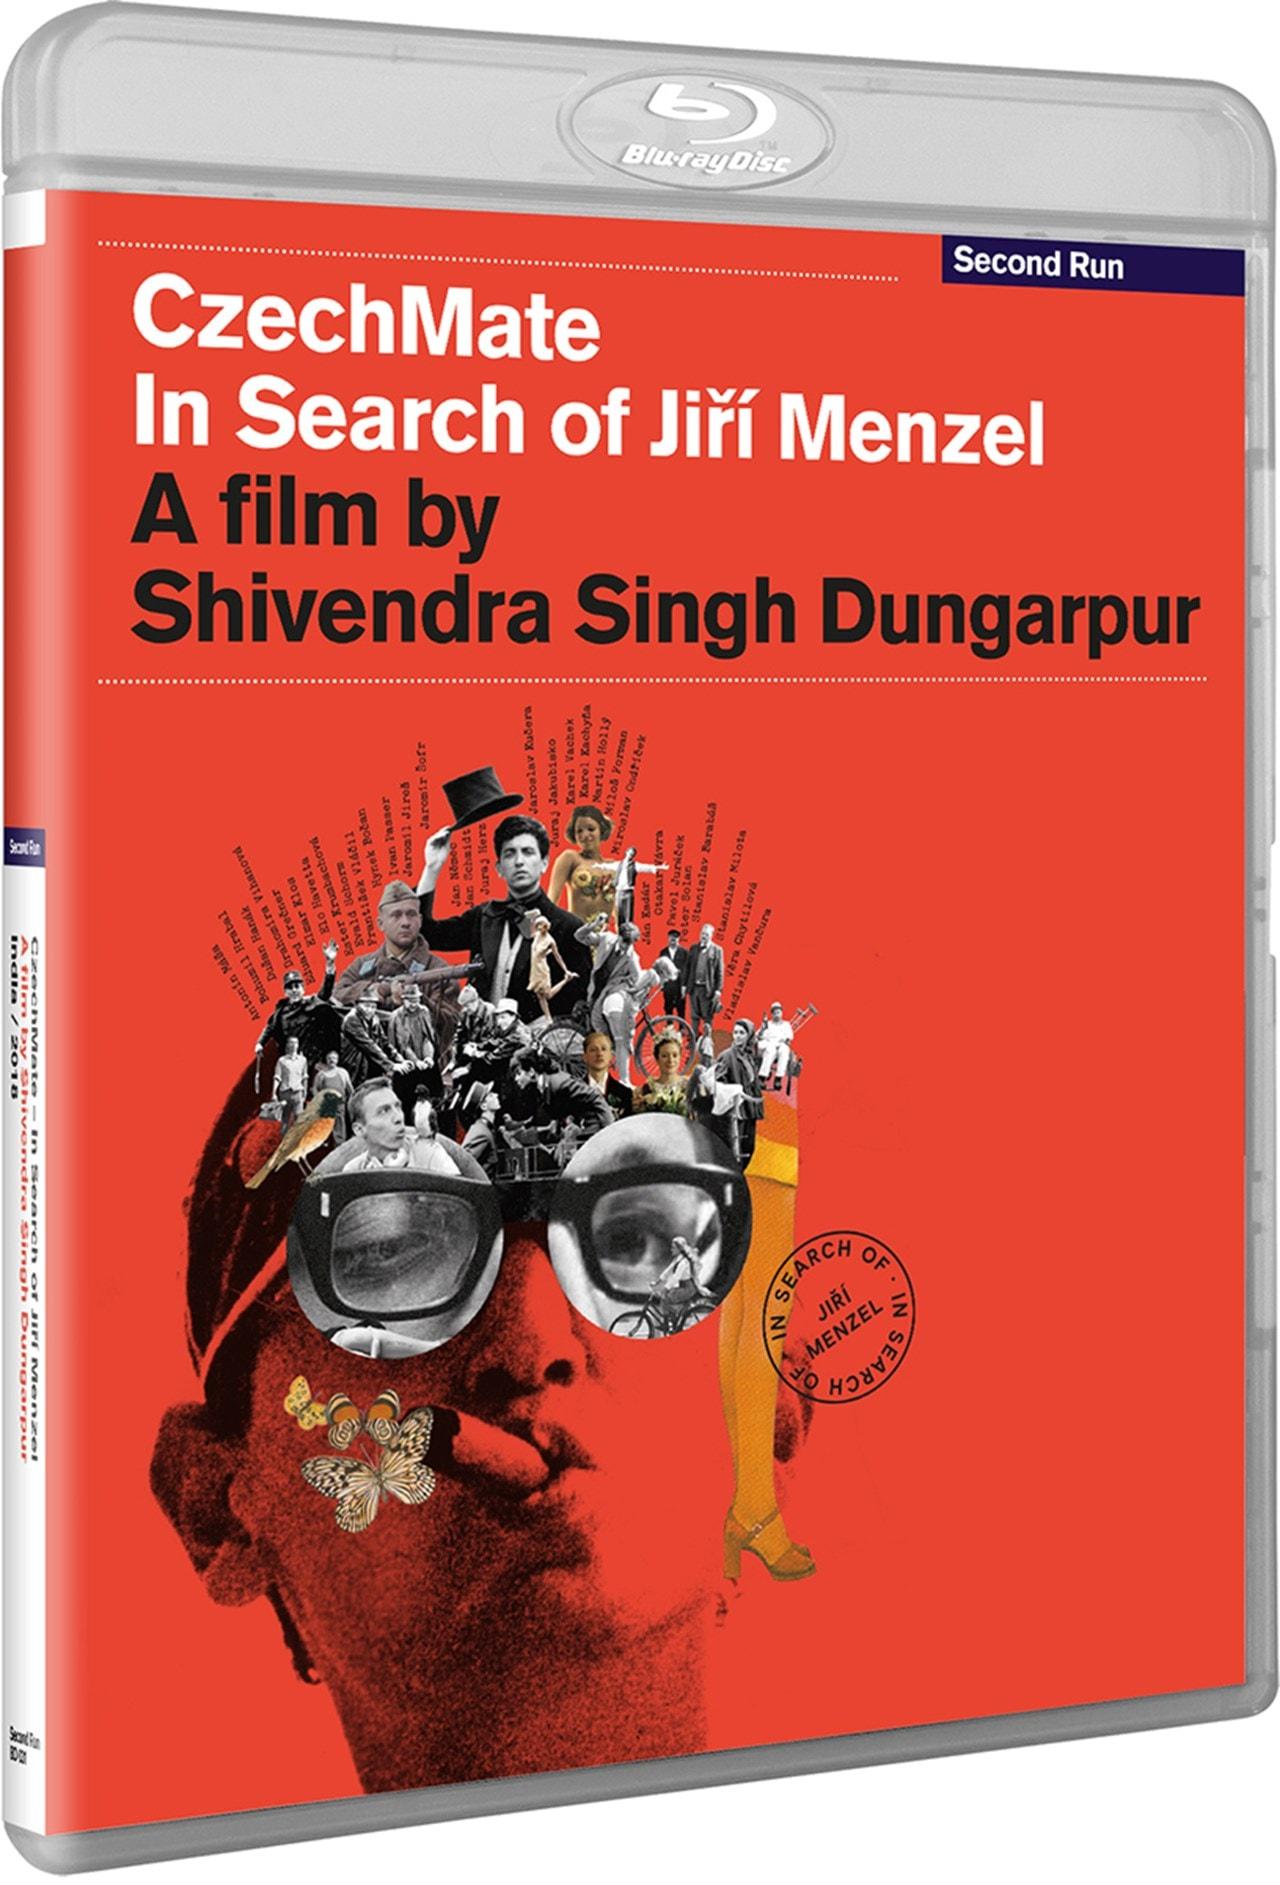 Czech Mate - In Search of Jiri Menzel - 2